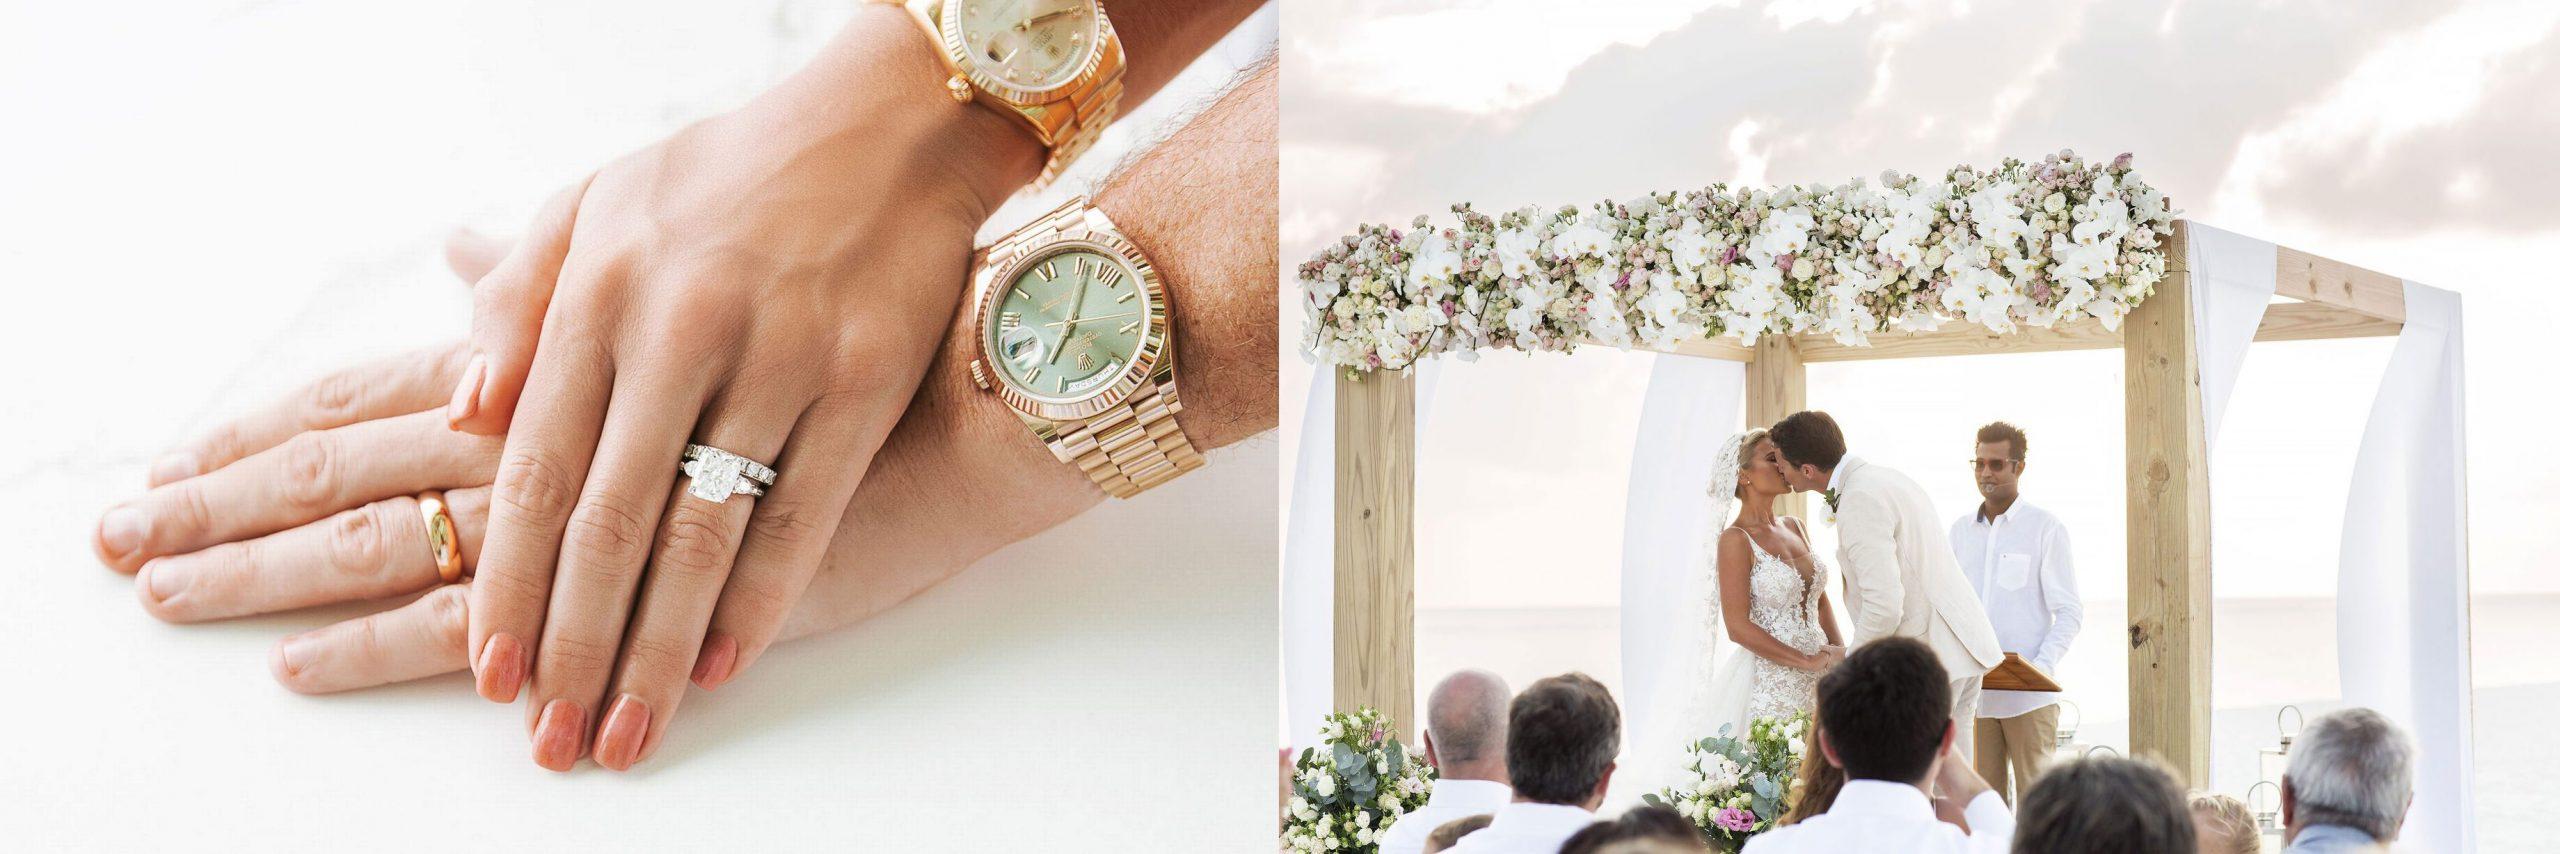 Billie Faier's engagement ring